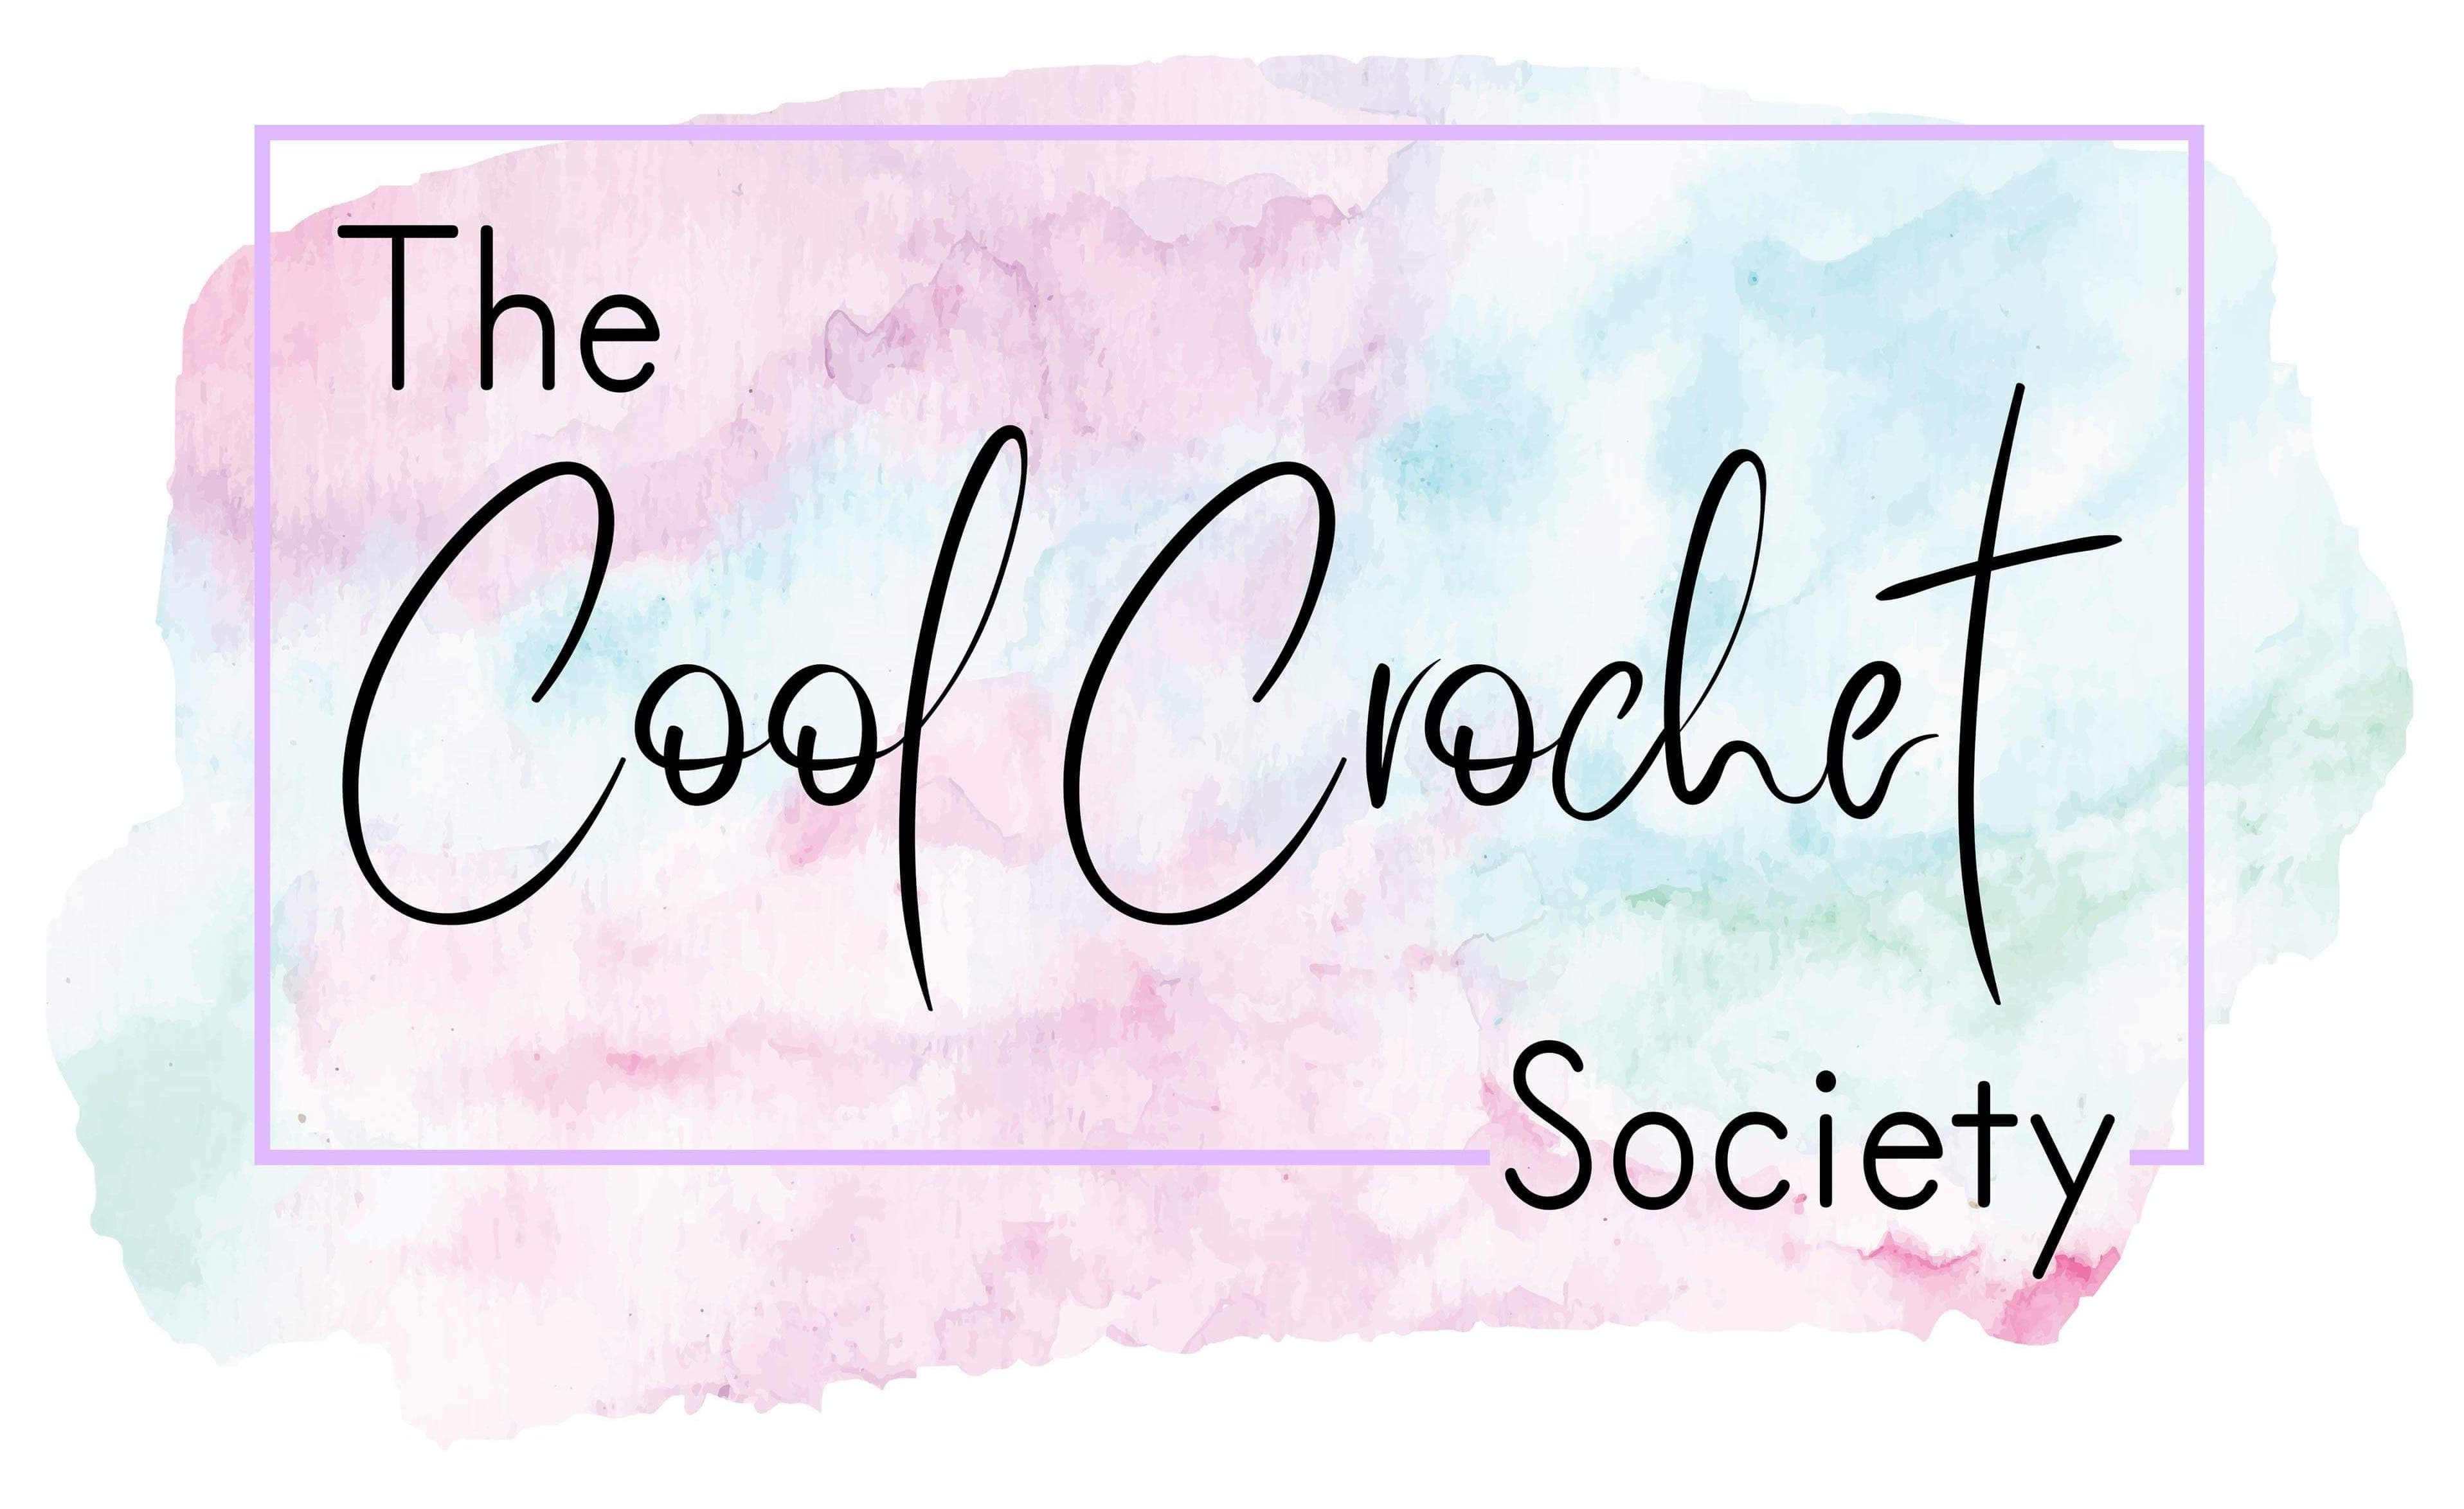 The Cool Crochet Society